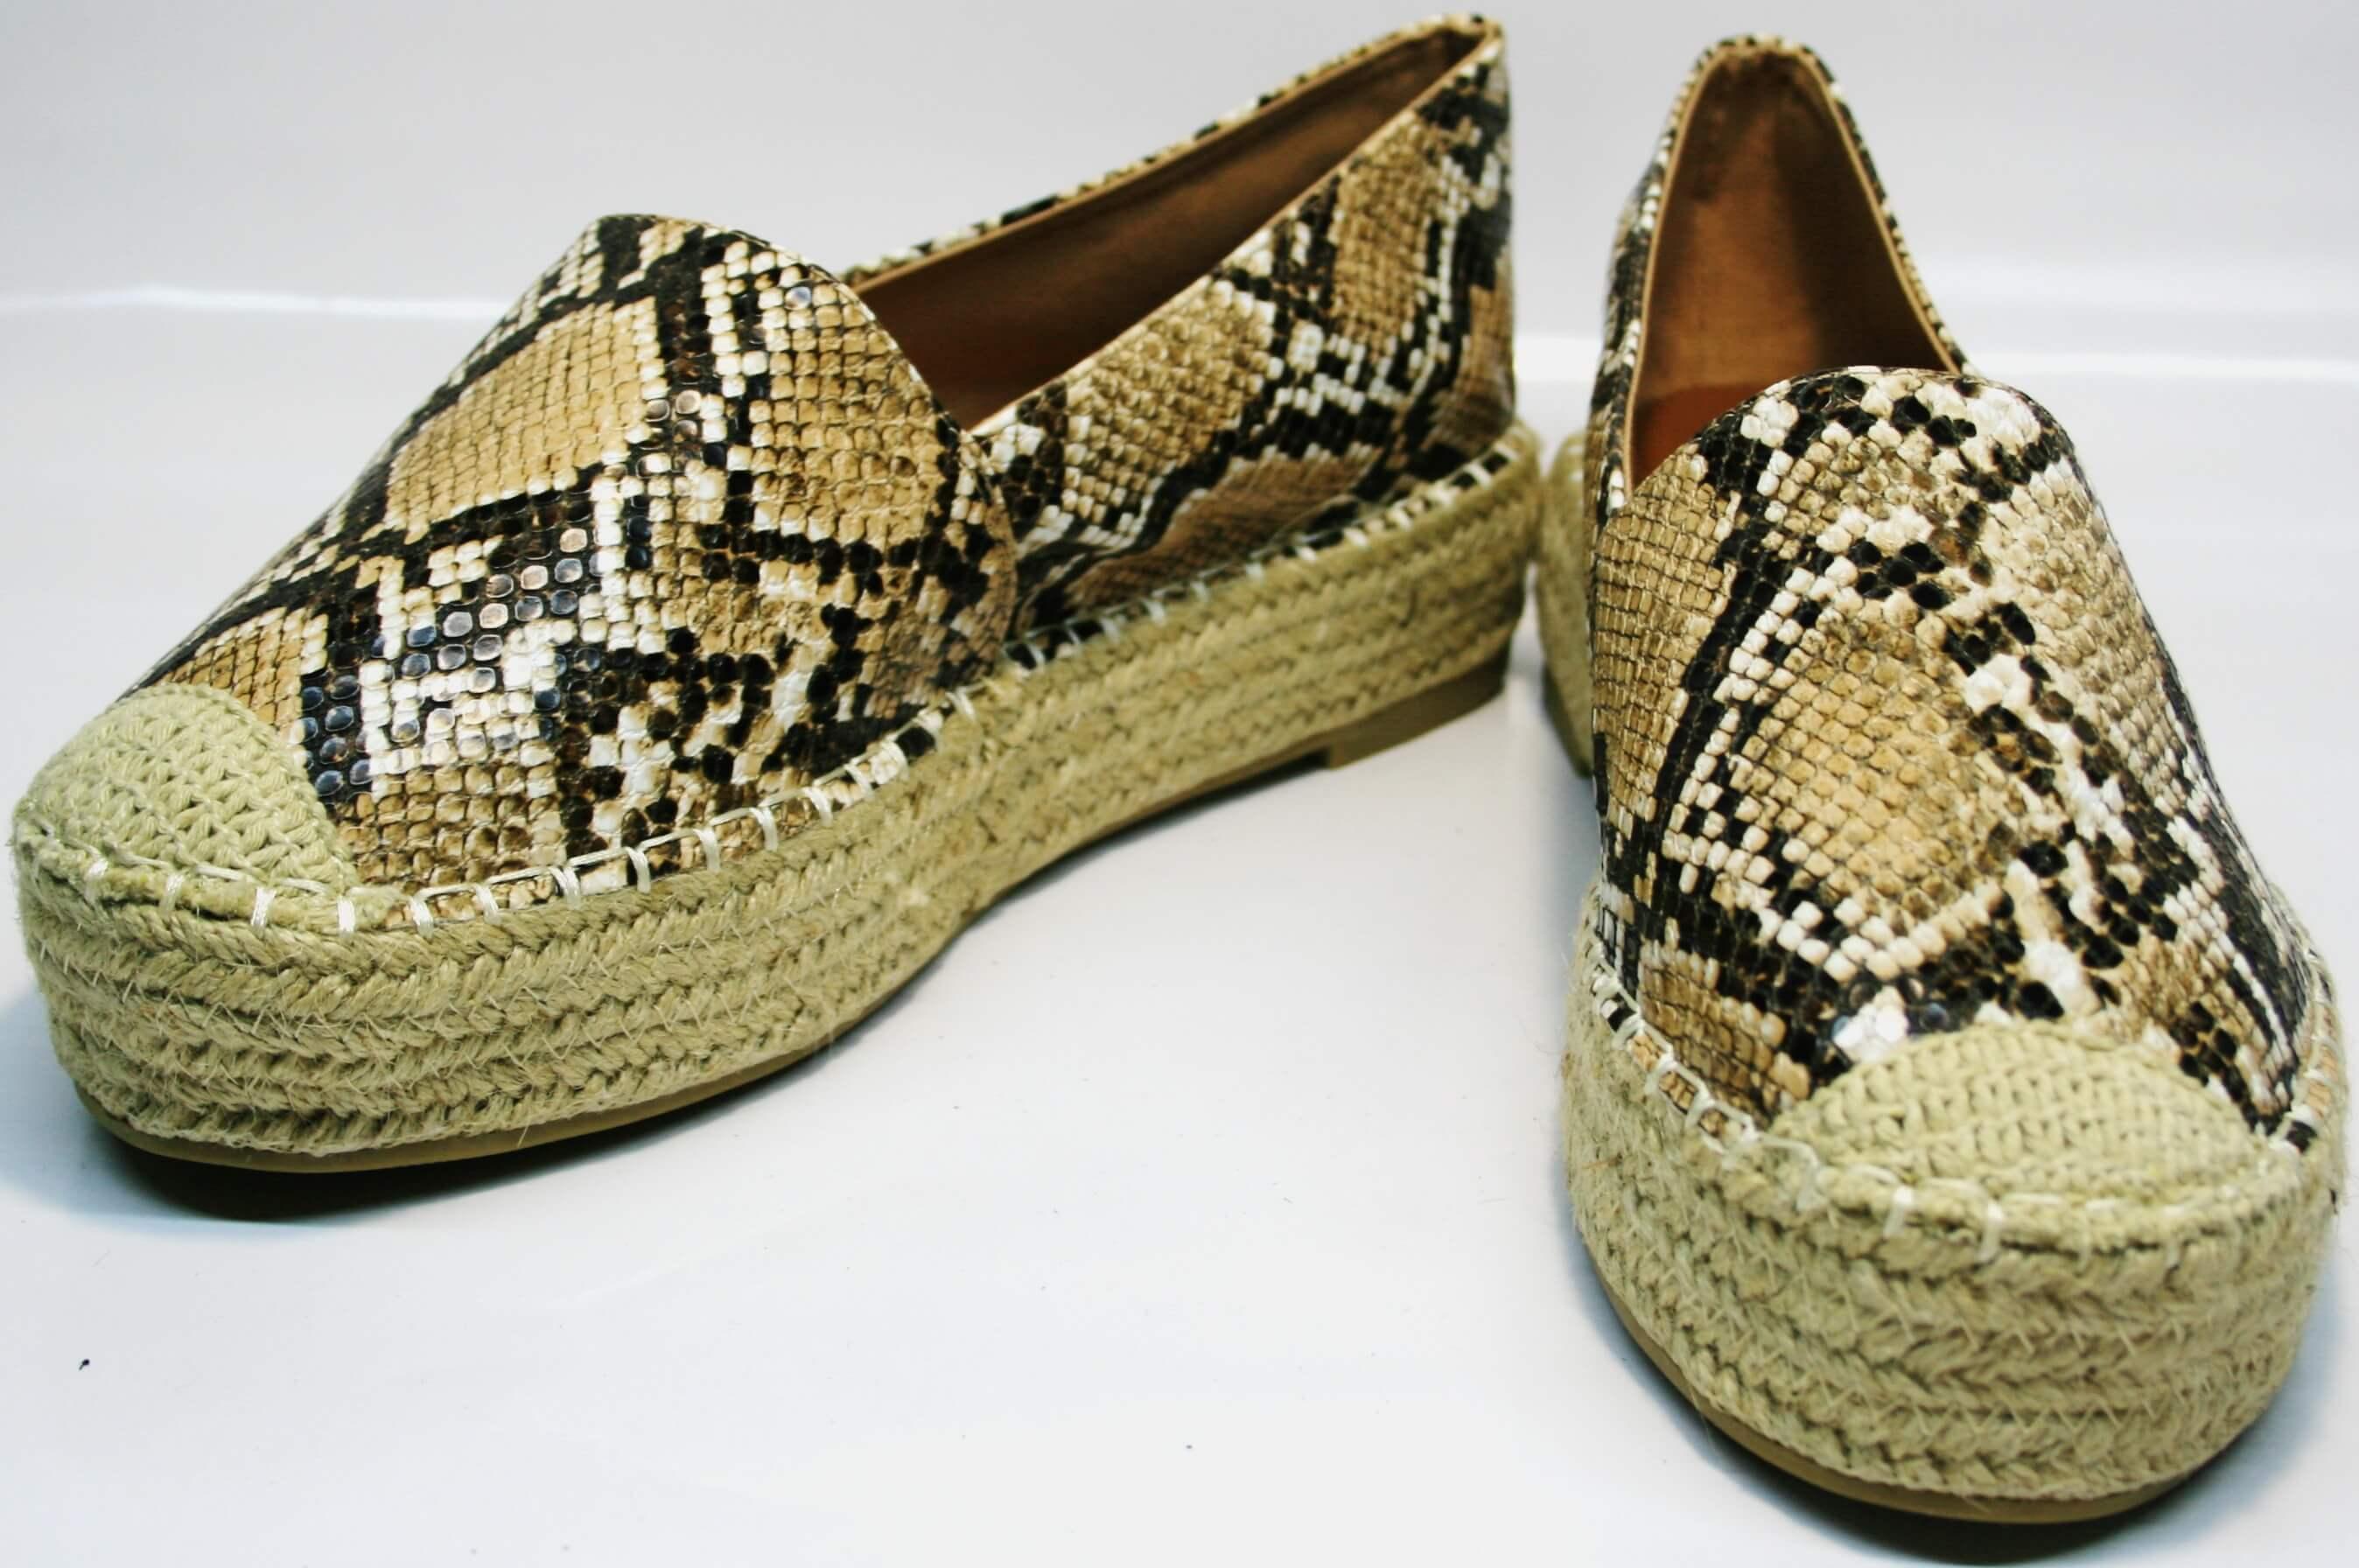 239cd3f0 Эспадрильи женские Lily shoes.